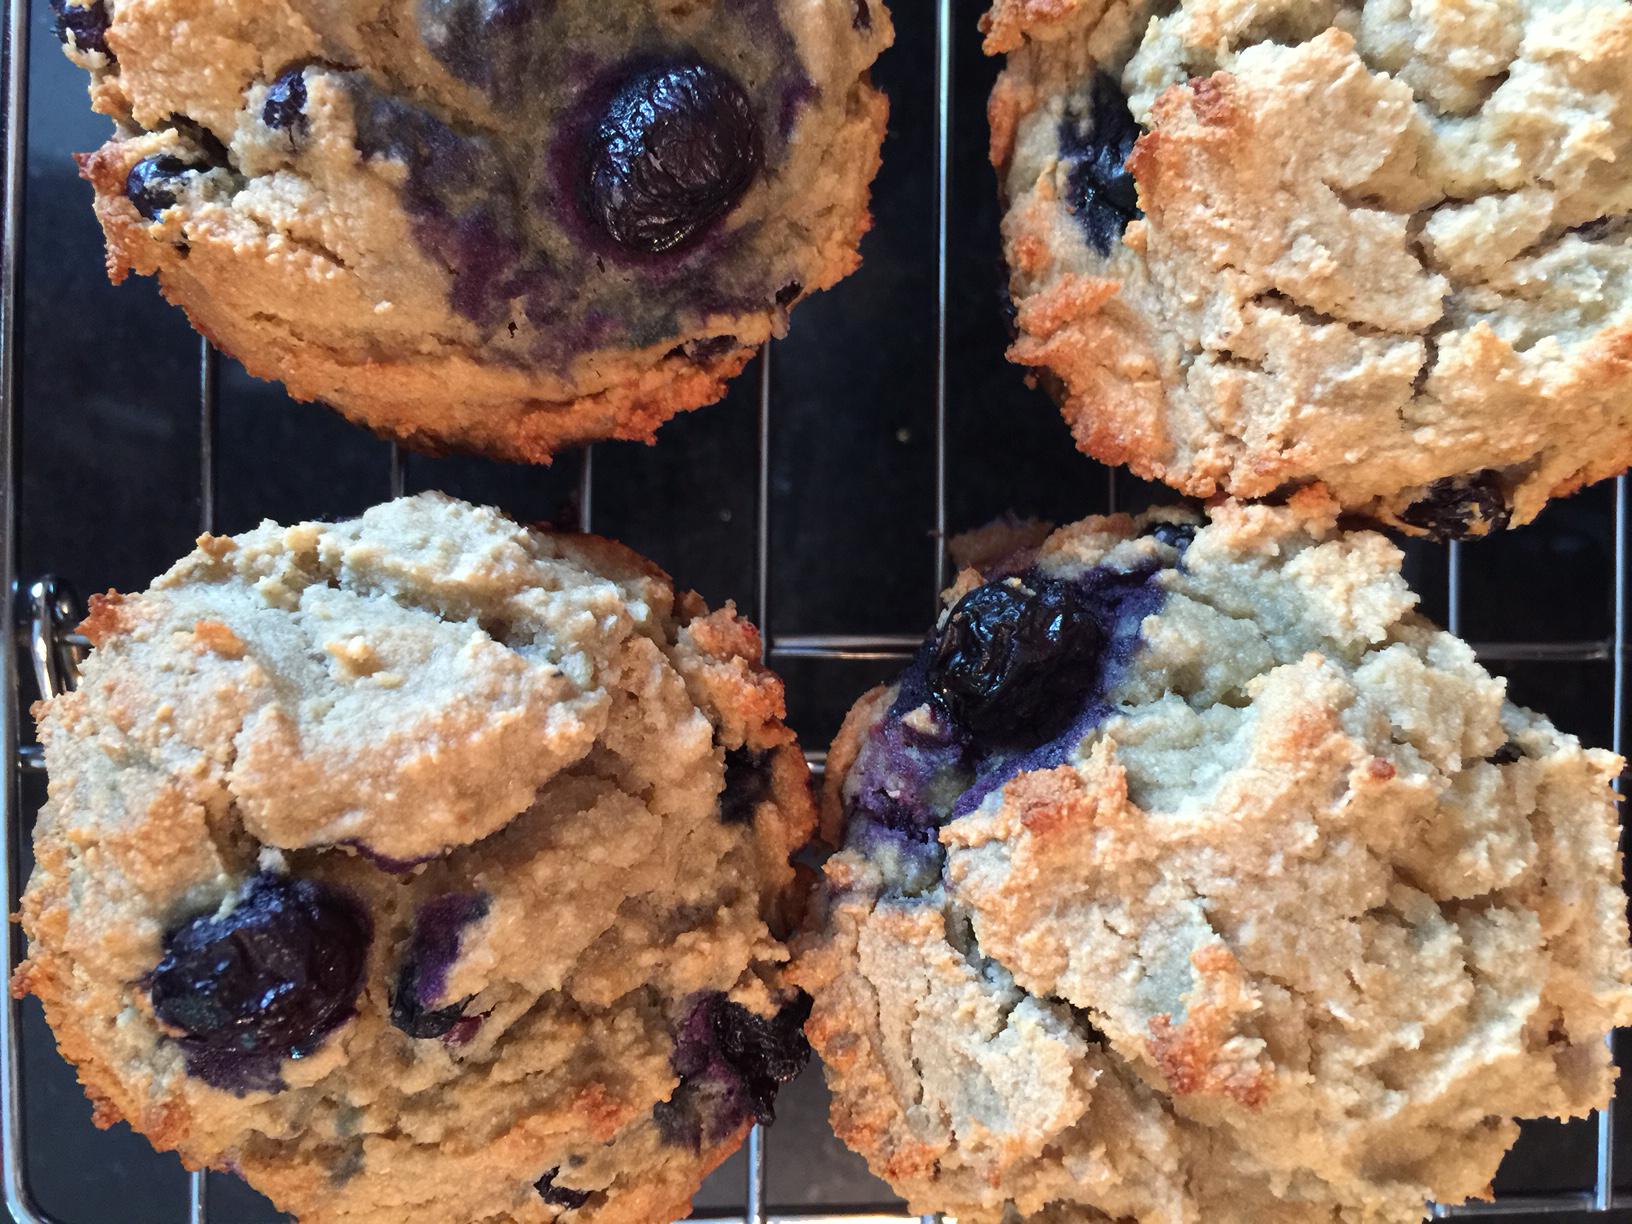 eating-understood-muffins-on-rack.png